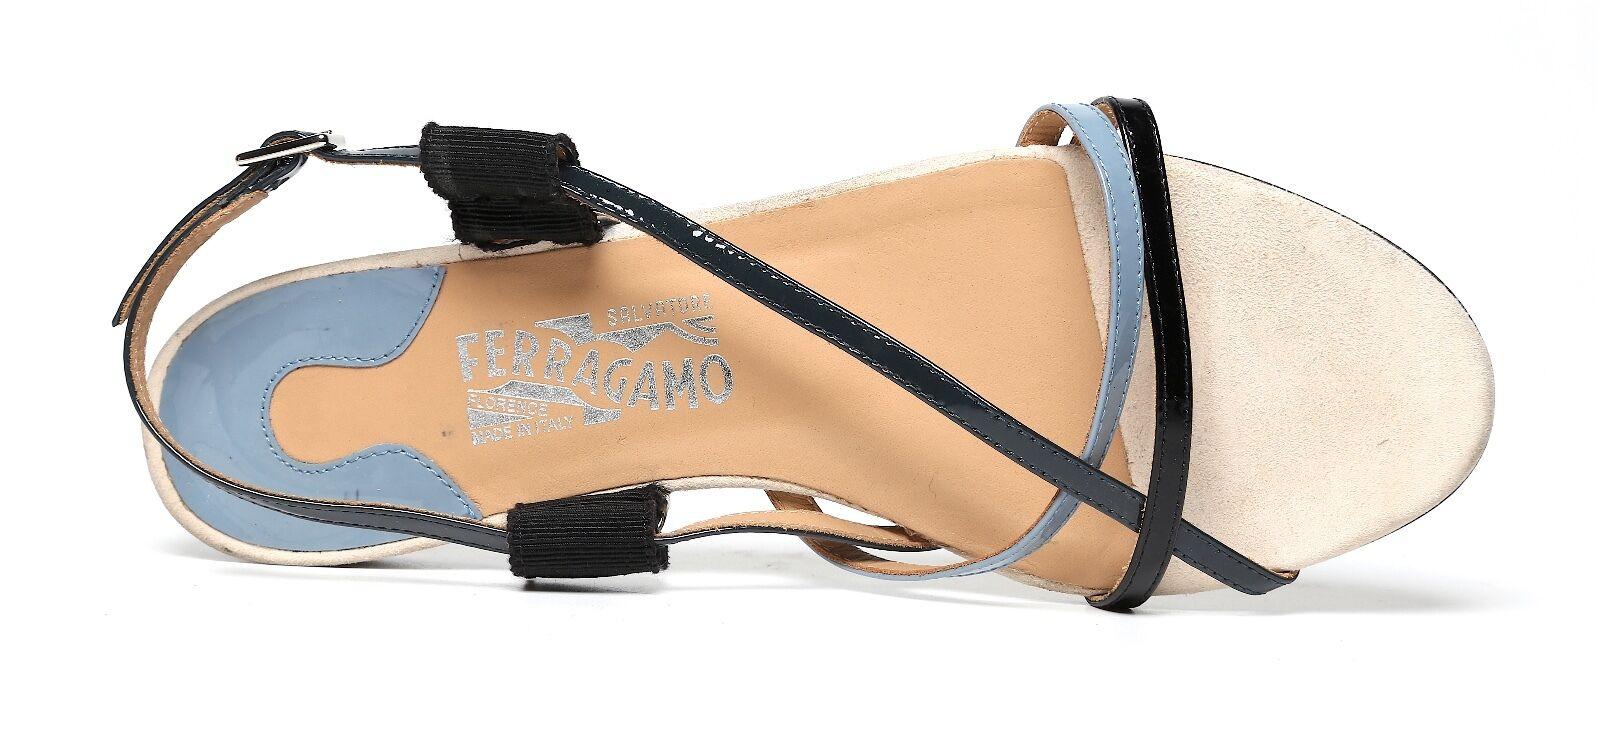 Salvatore Ferragamo Größe Multi-Farbeed Flat Sandales 2138 Größe Ferragamo 7.5 665866